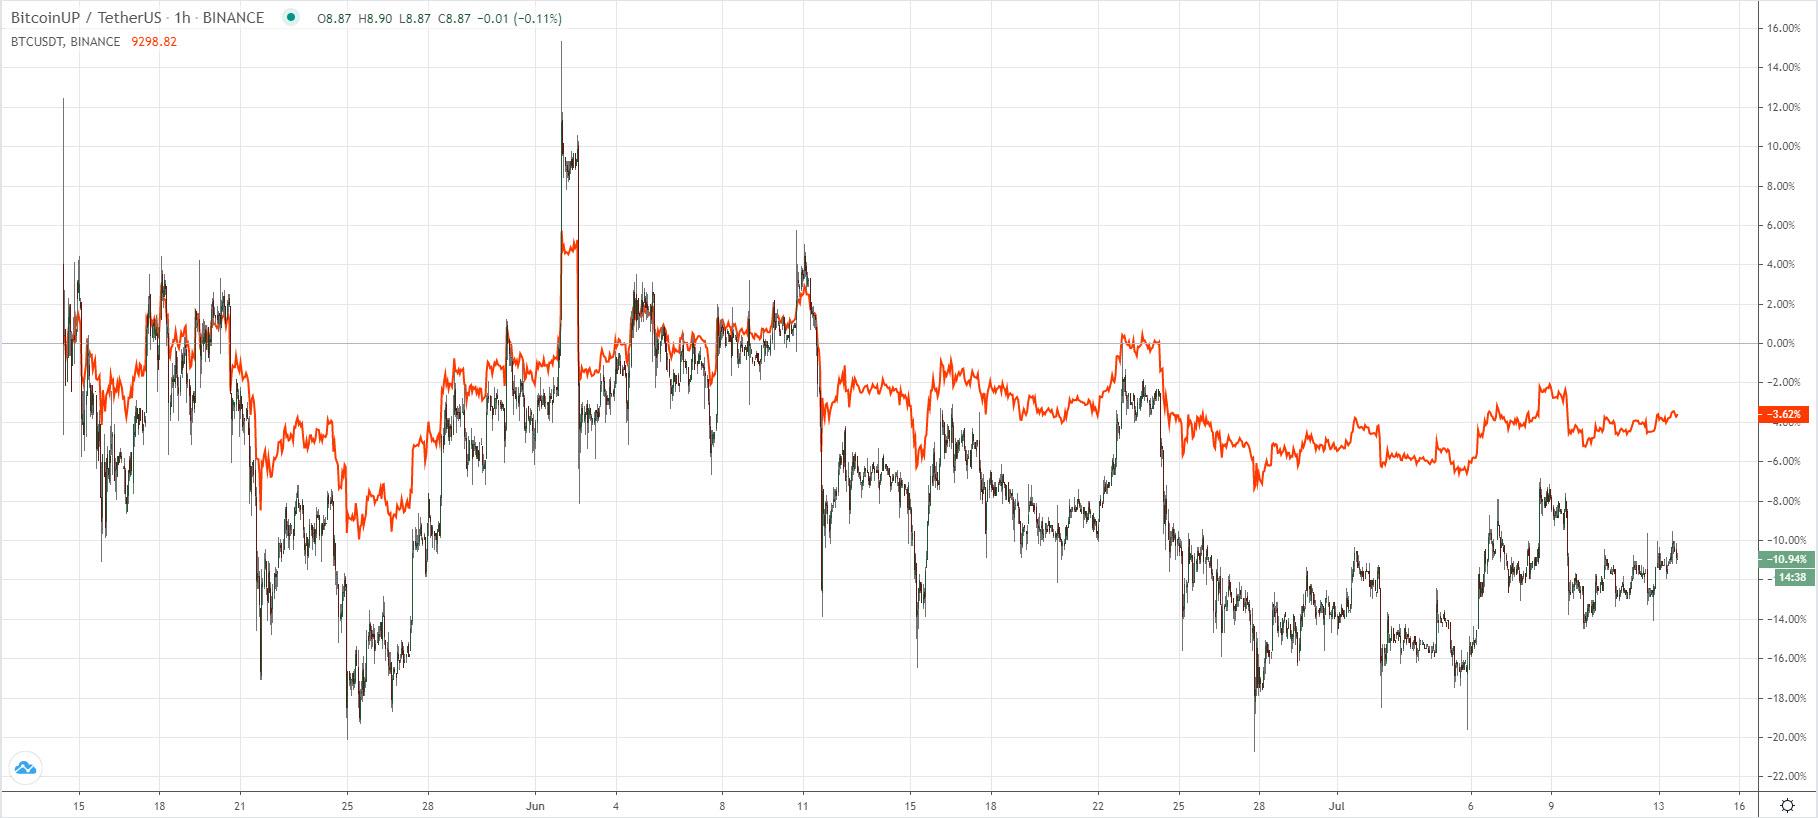 дисбаланс BTCUP/USDT + BTCDOWN/USDT